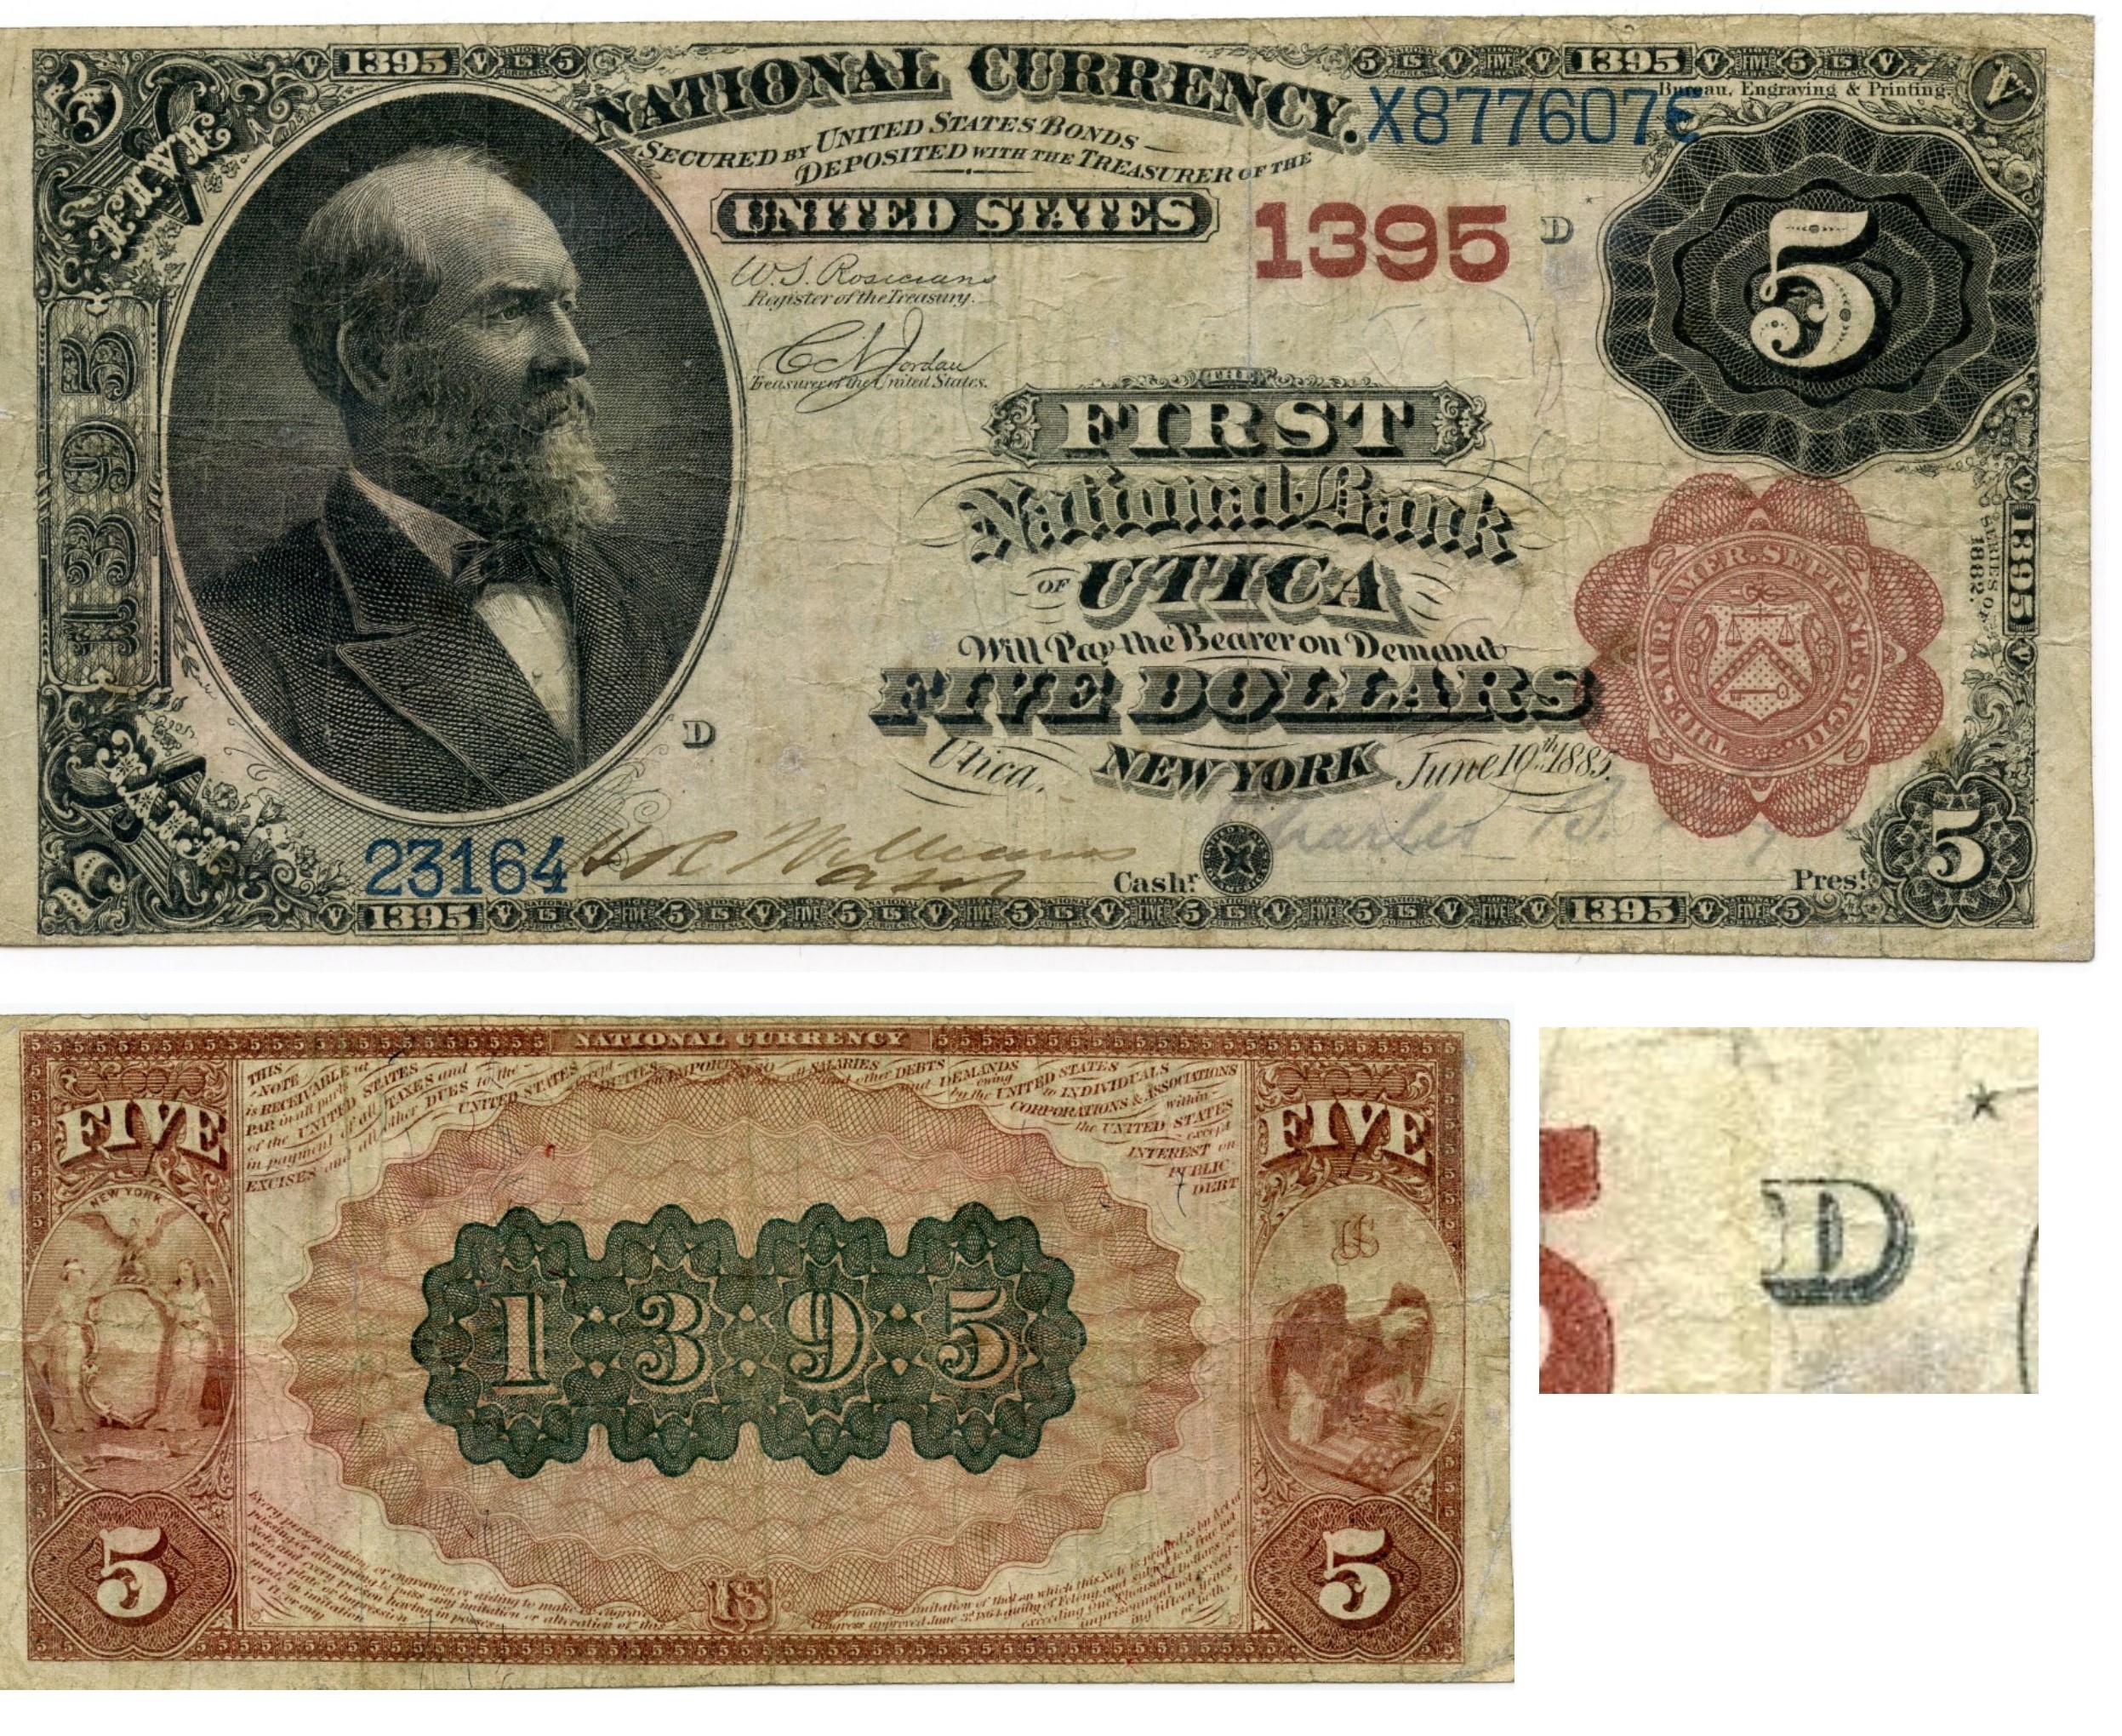 NY, Utica, 82BB, ch.1395, FR469, FNB, $5, Re-engraved STAR note.jpg